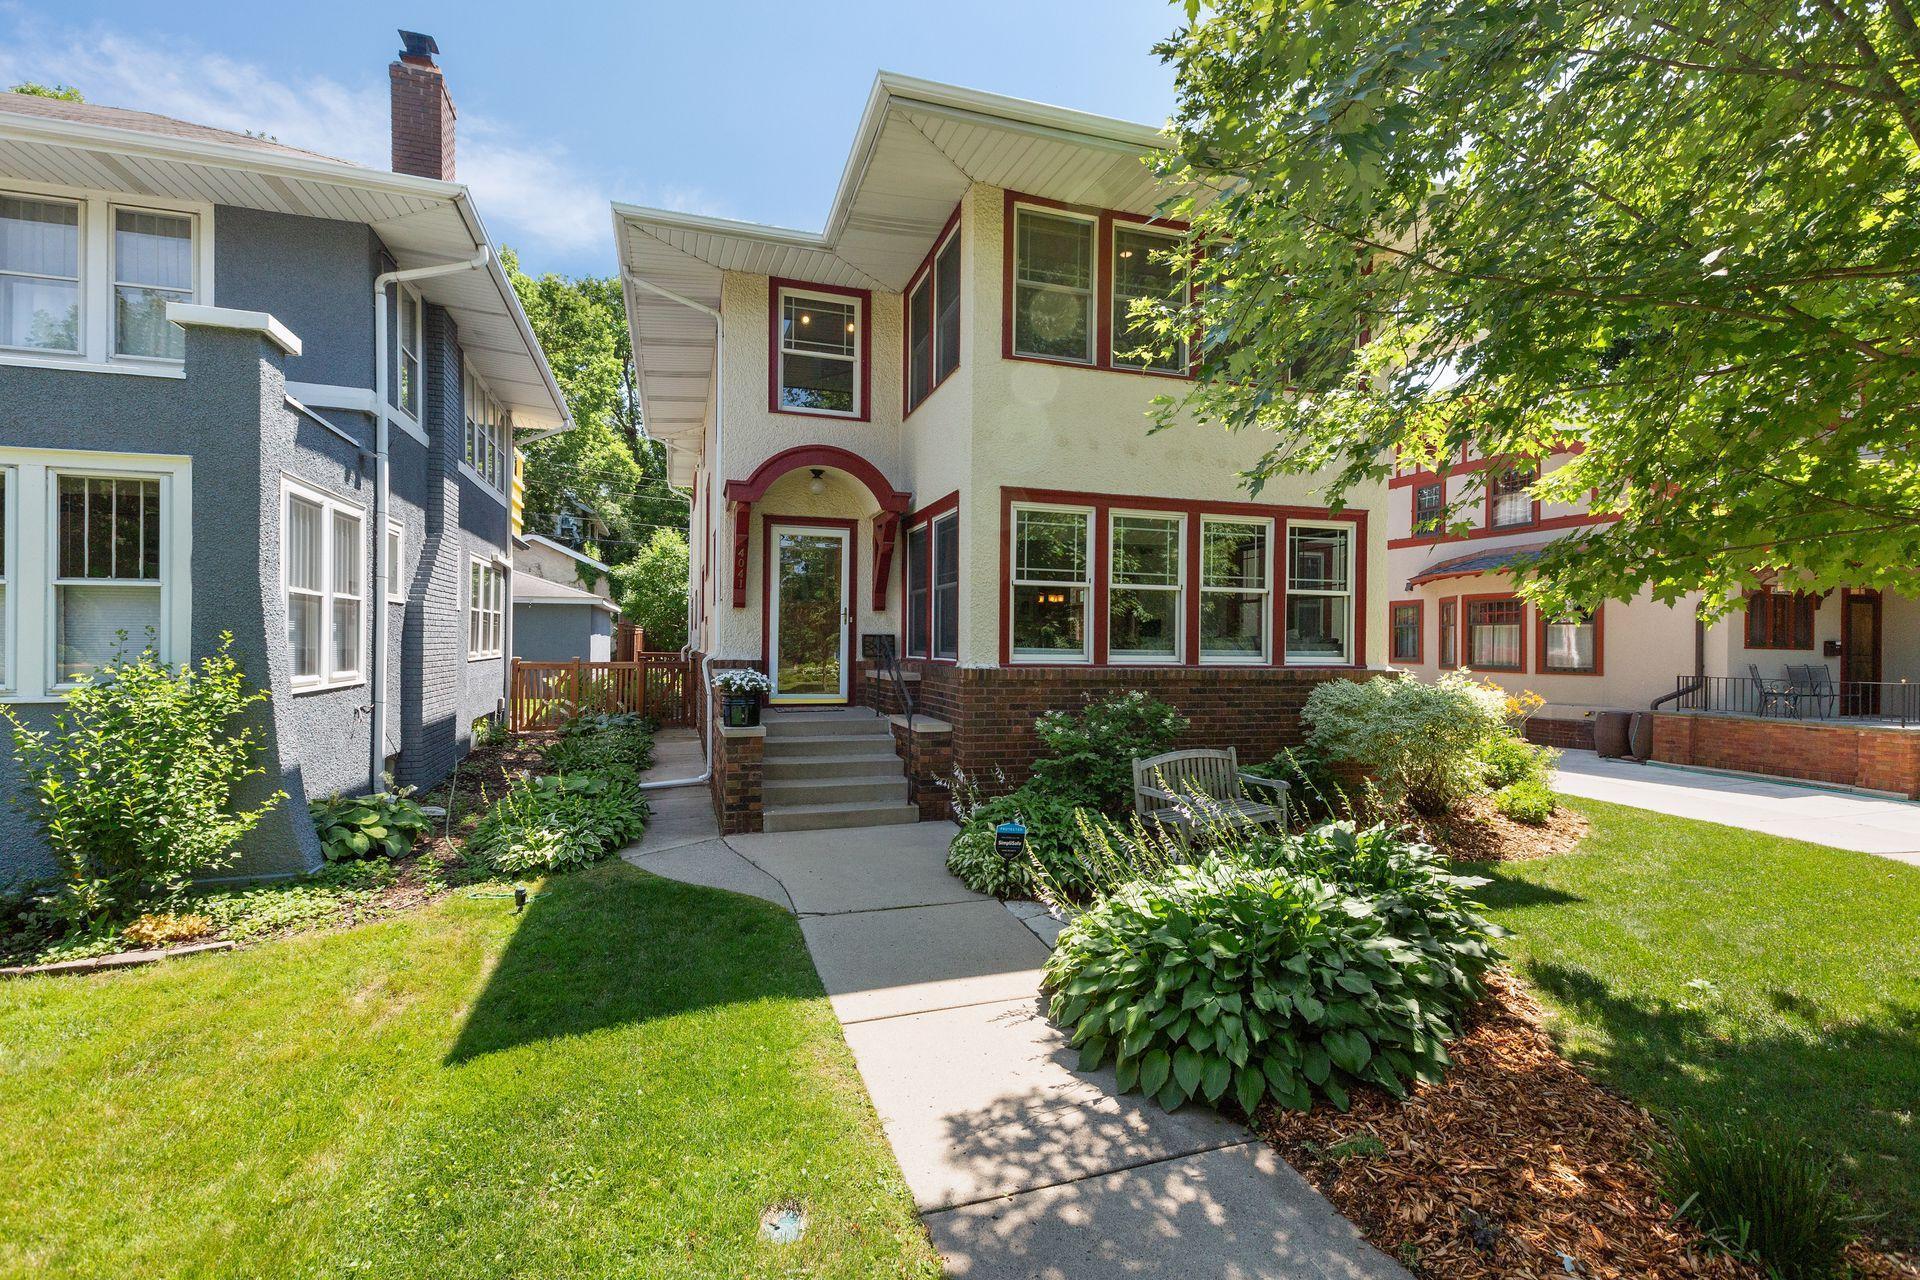 4041 Dupont S Property Photo - Minneapolis, MN real estate listing